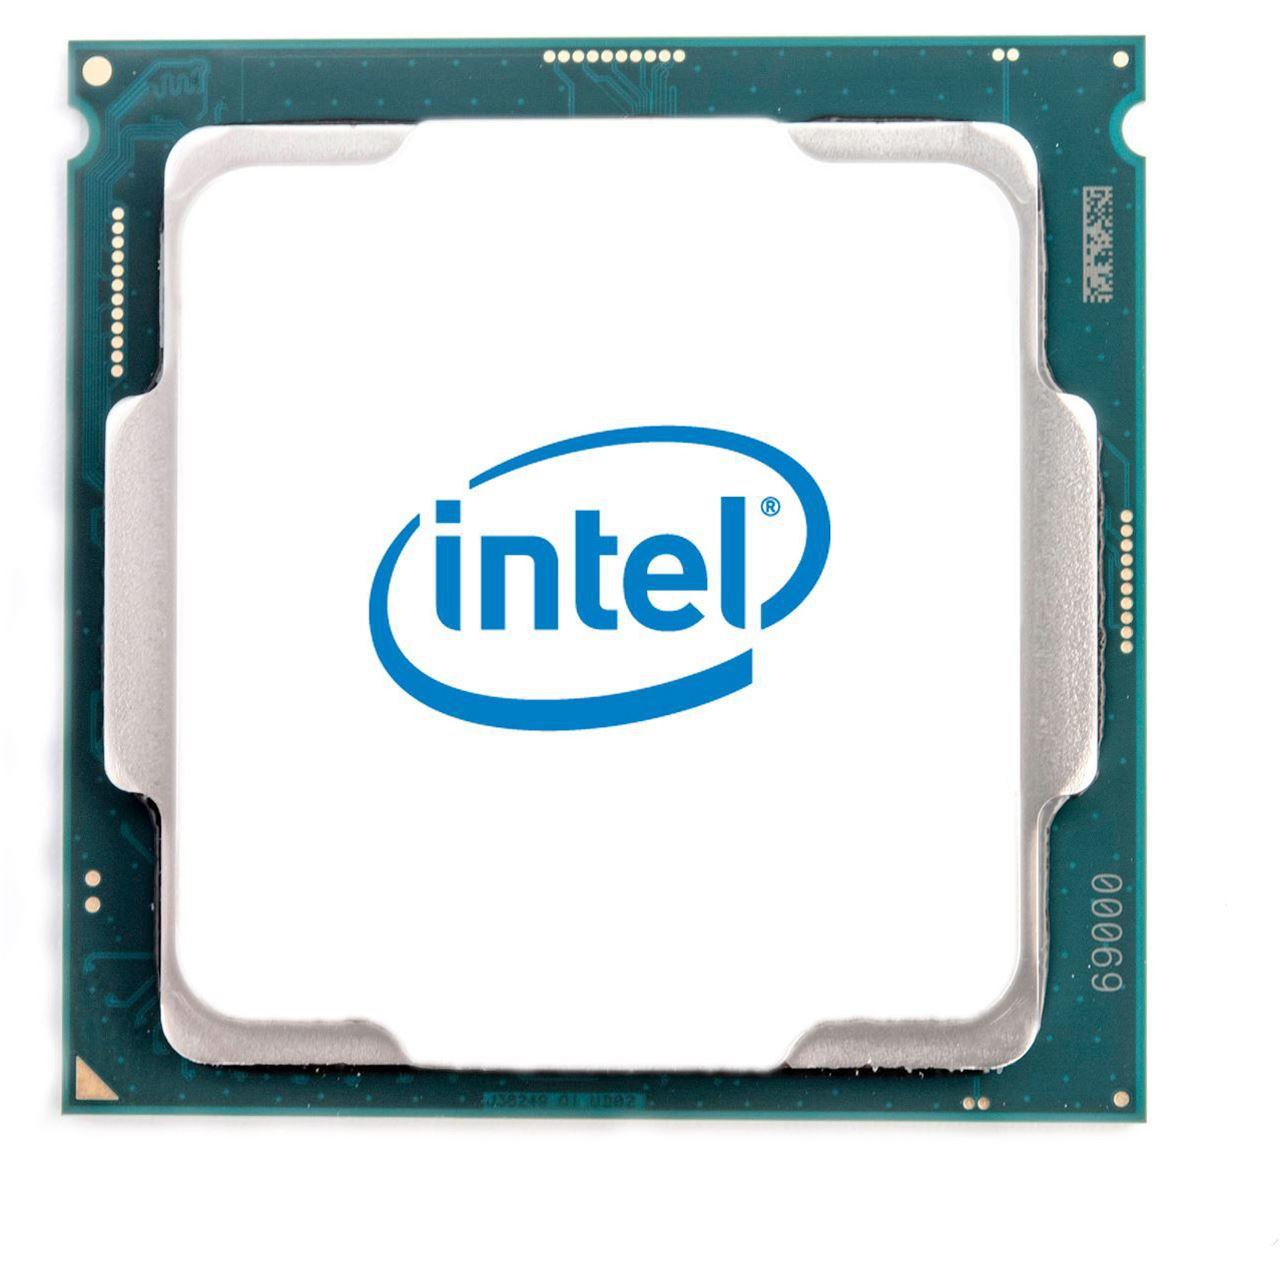 INTEL CPU CORE i7-9700K 3.6GHZ 8MB LGA1151 9TH GEN - BX80684I79700K